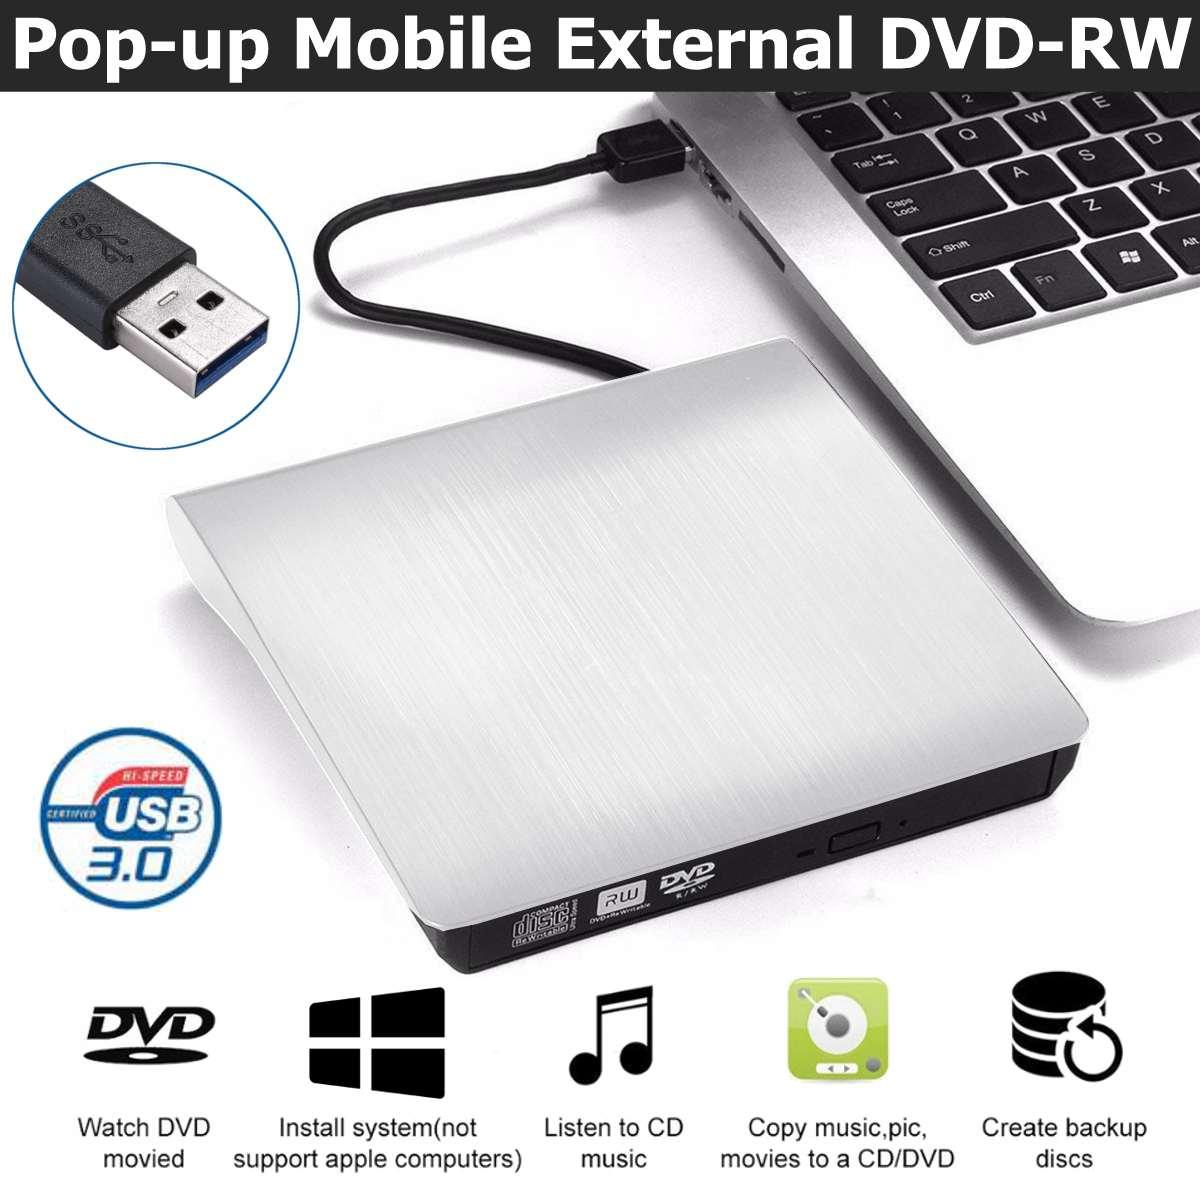 New White USB 3.0 Slim External DVD RW CD Writer Drive Burner Reader Player Optical Drives For Laptop PC